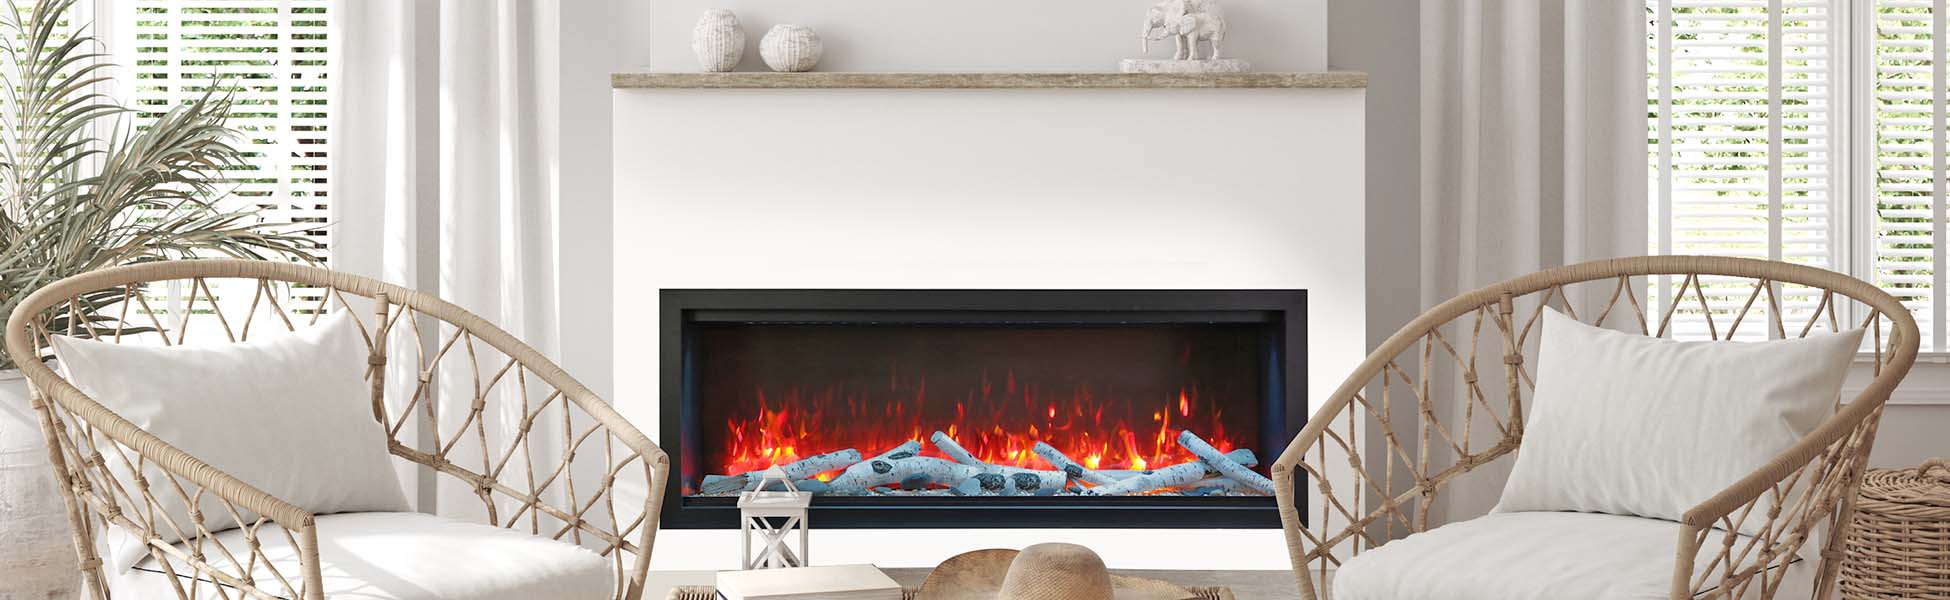 SYM-60-XT-BESPOKE fireplace